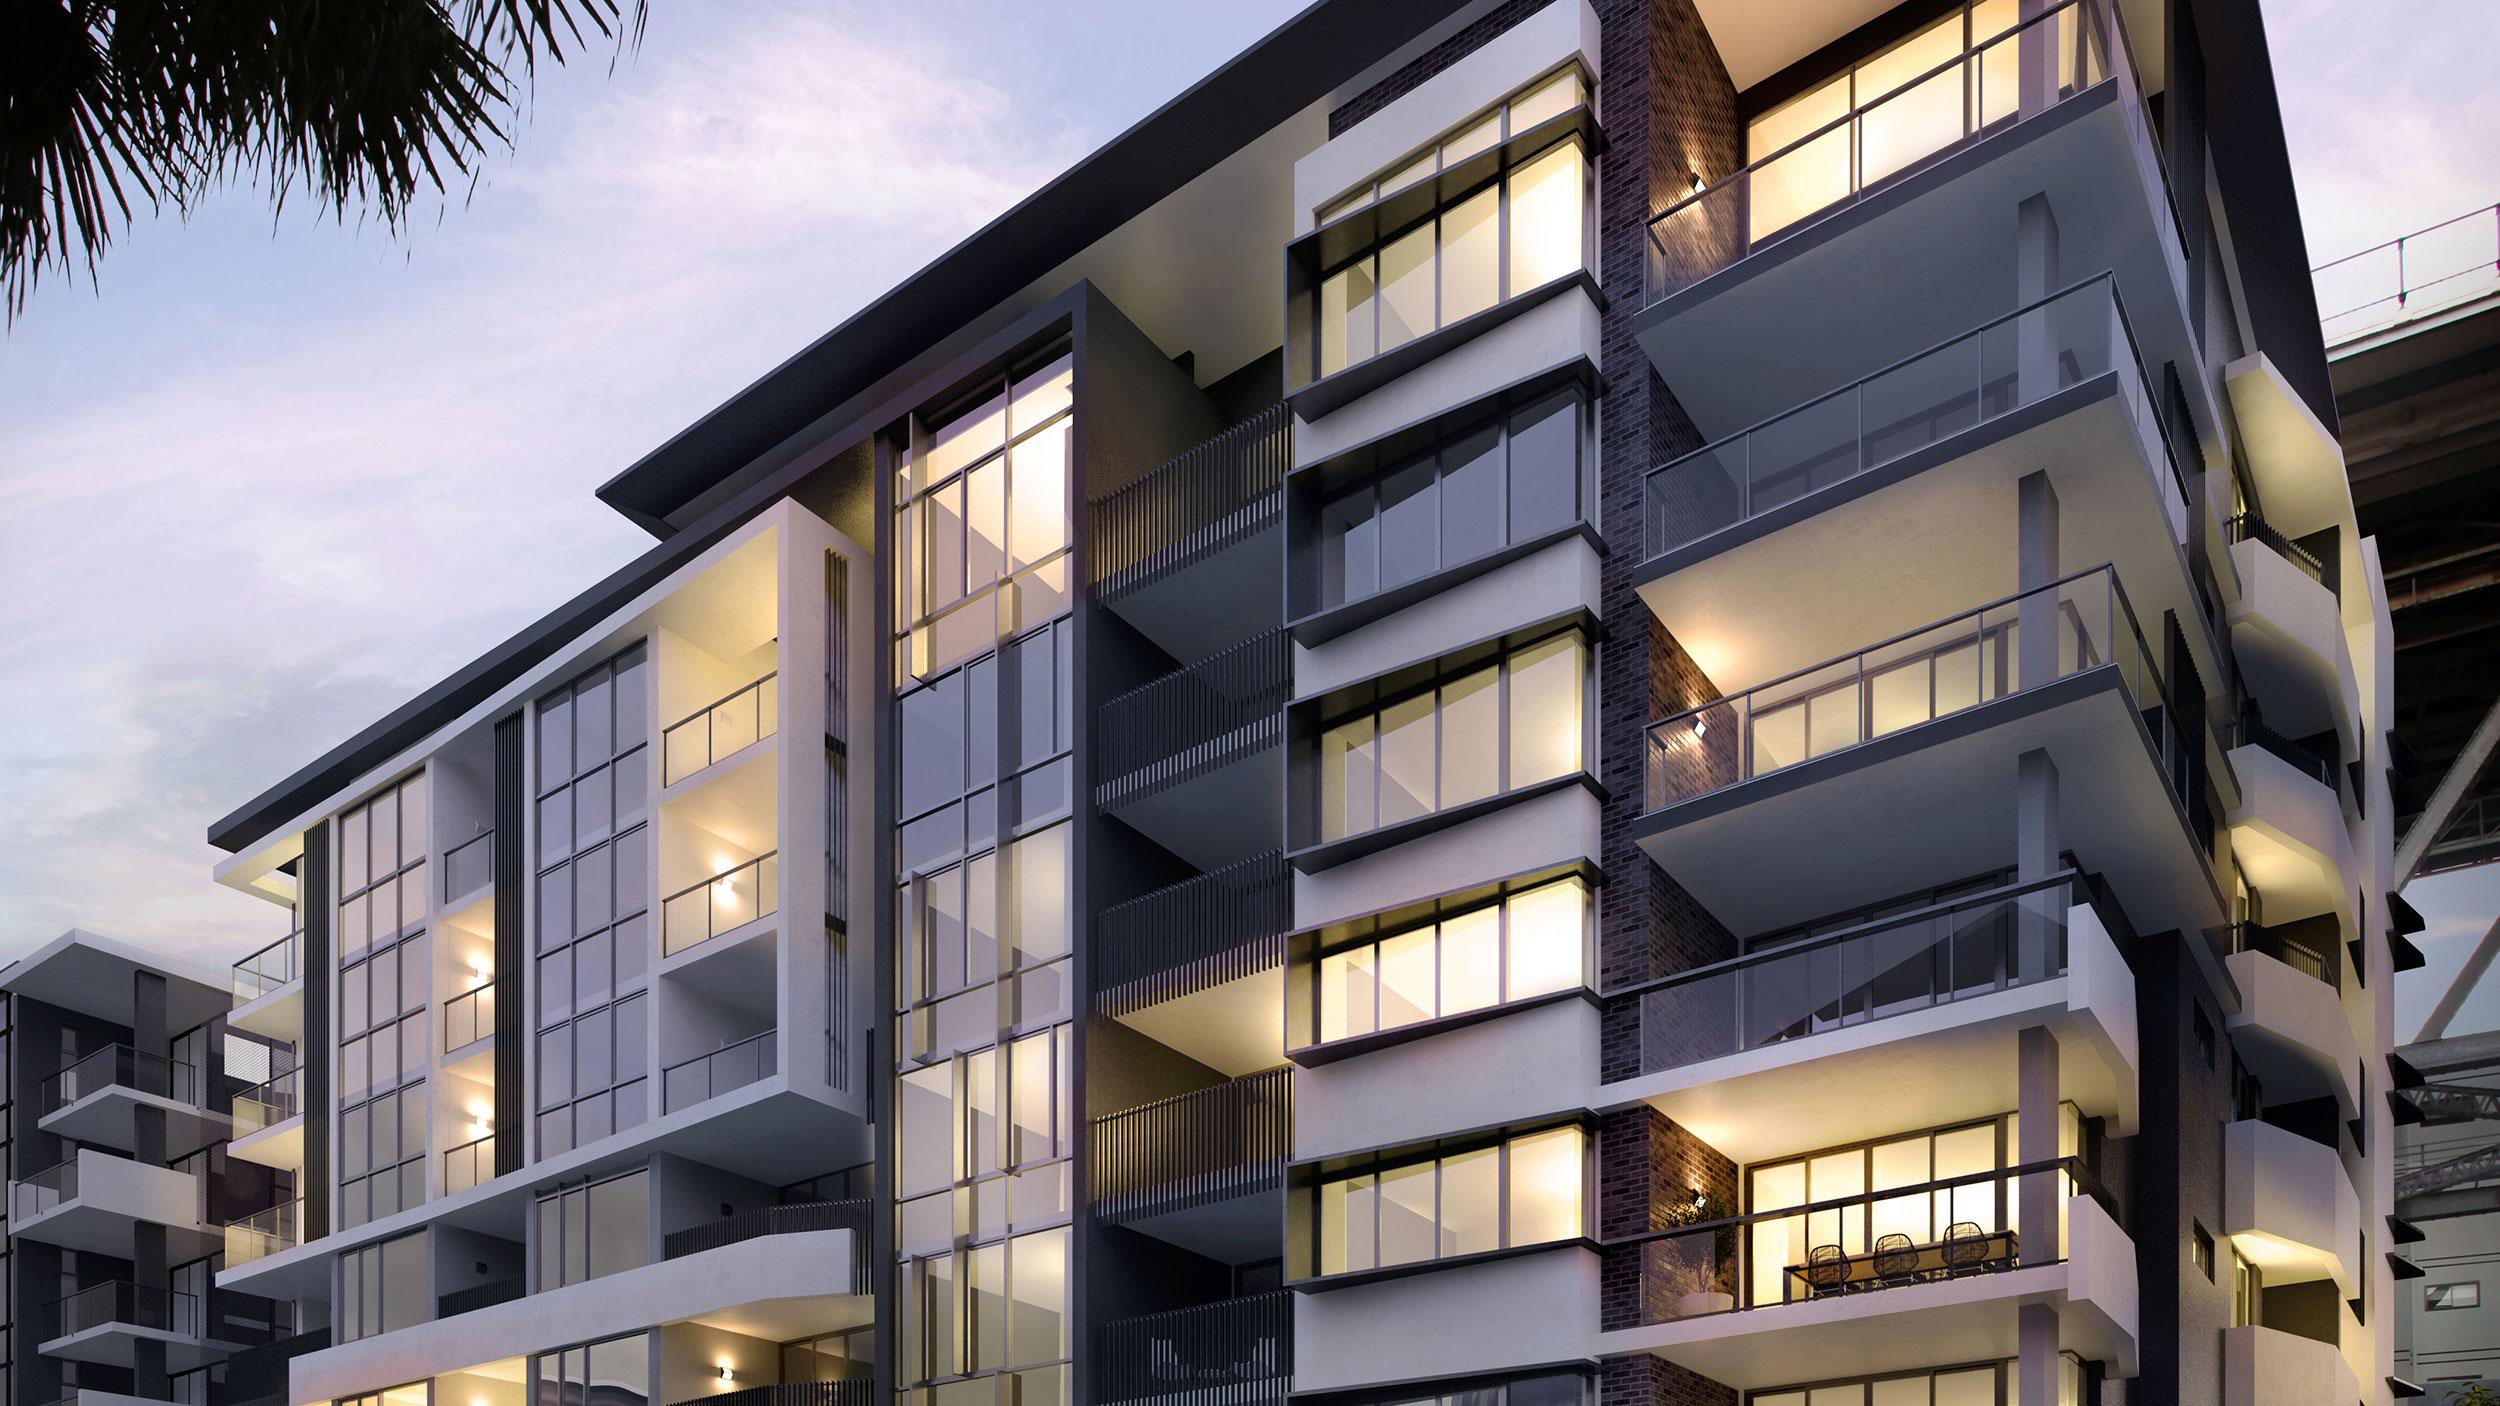 kp-explore-design-and-architecture-image1